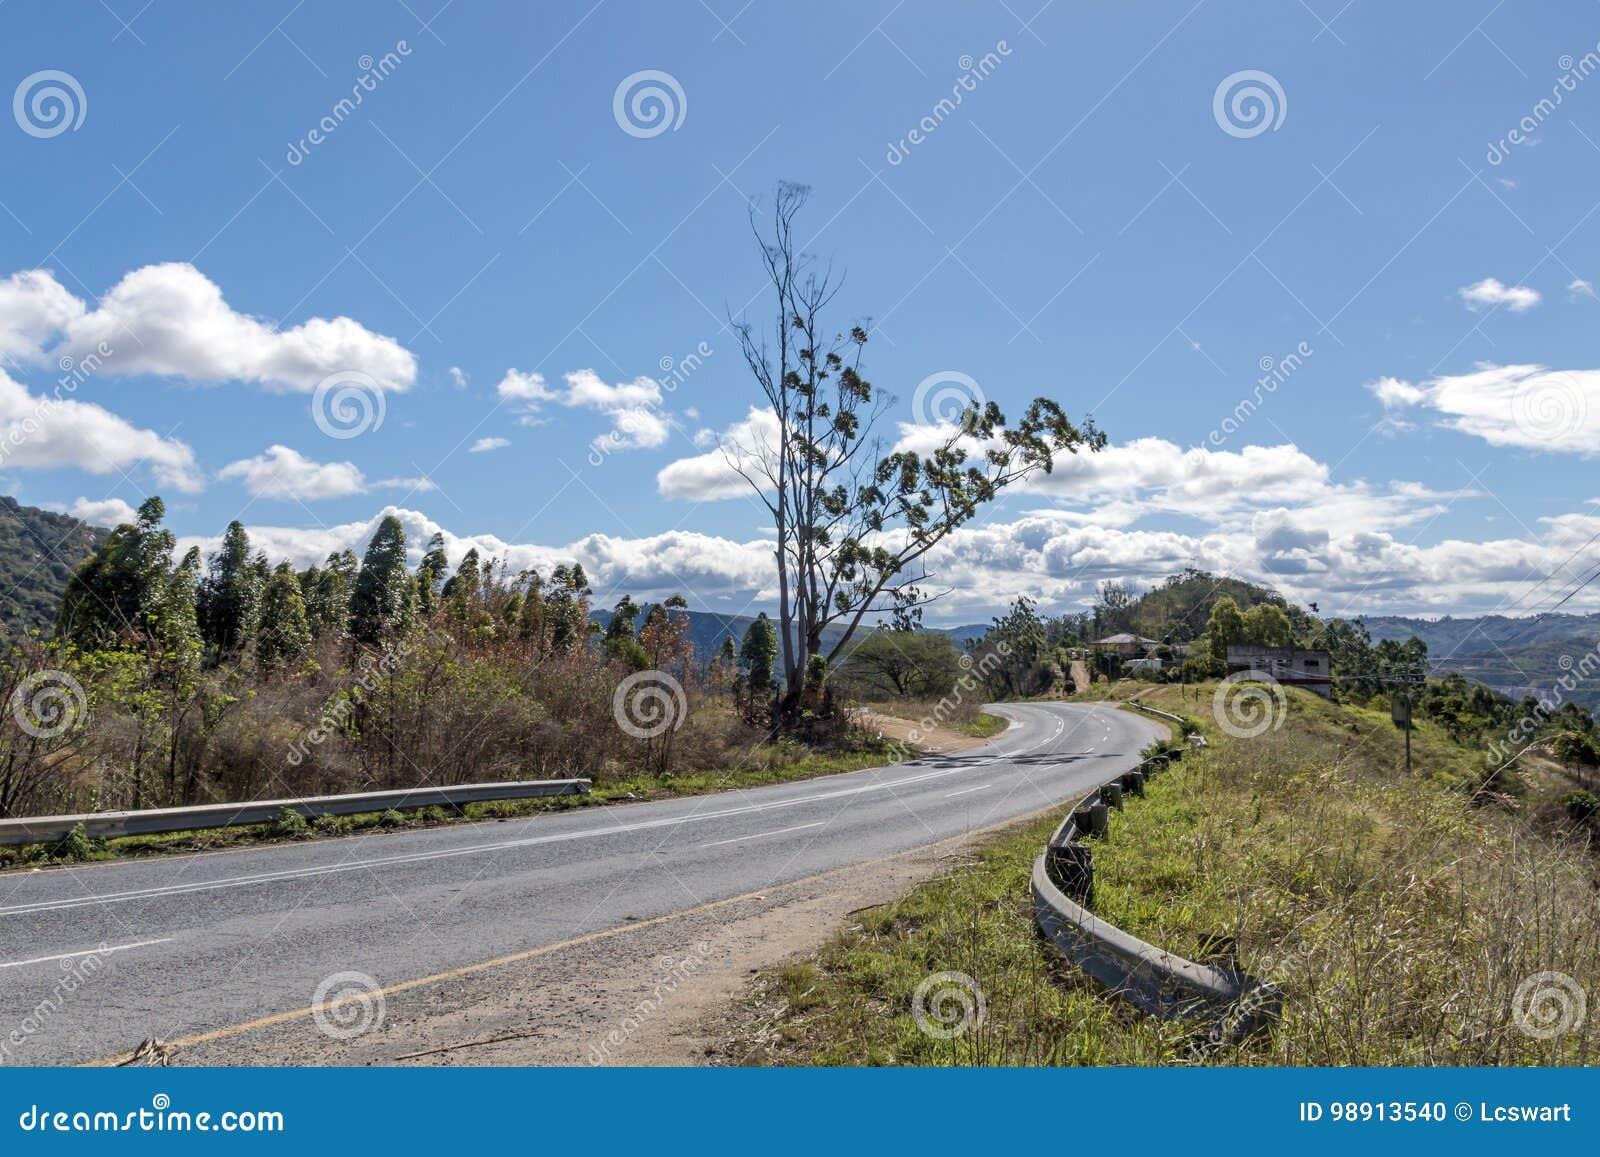 Courber le Landscap sec d hiver d Asphalt Country Road Running Through